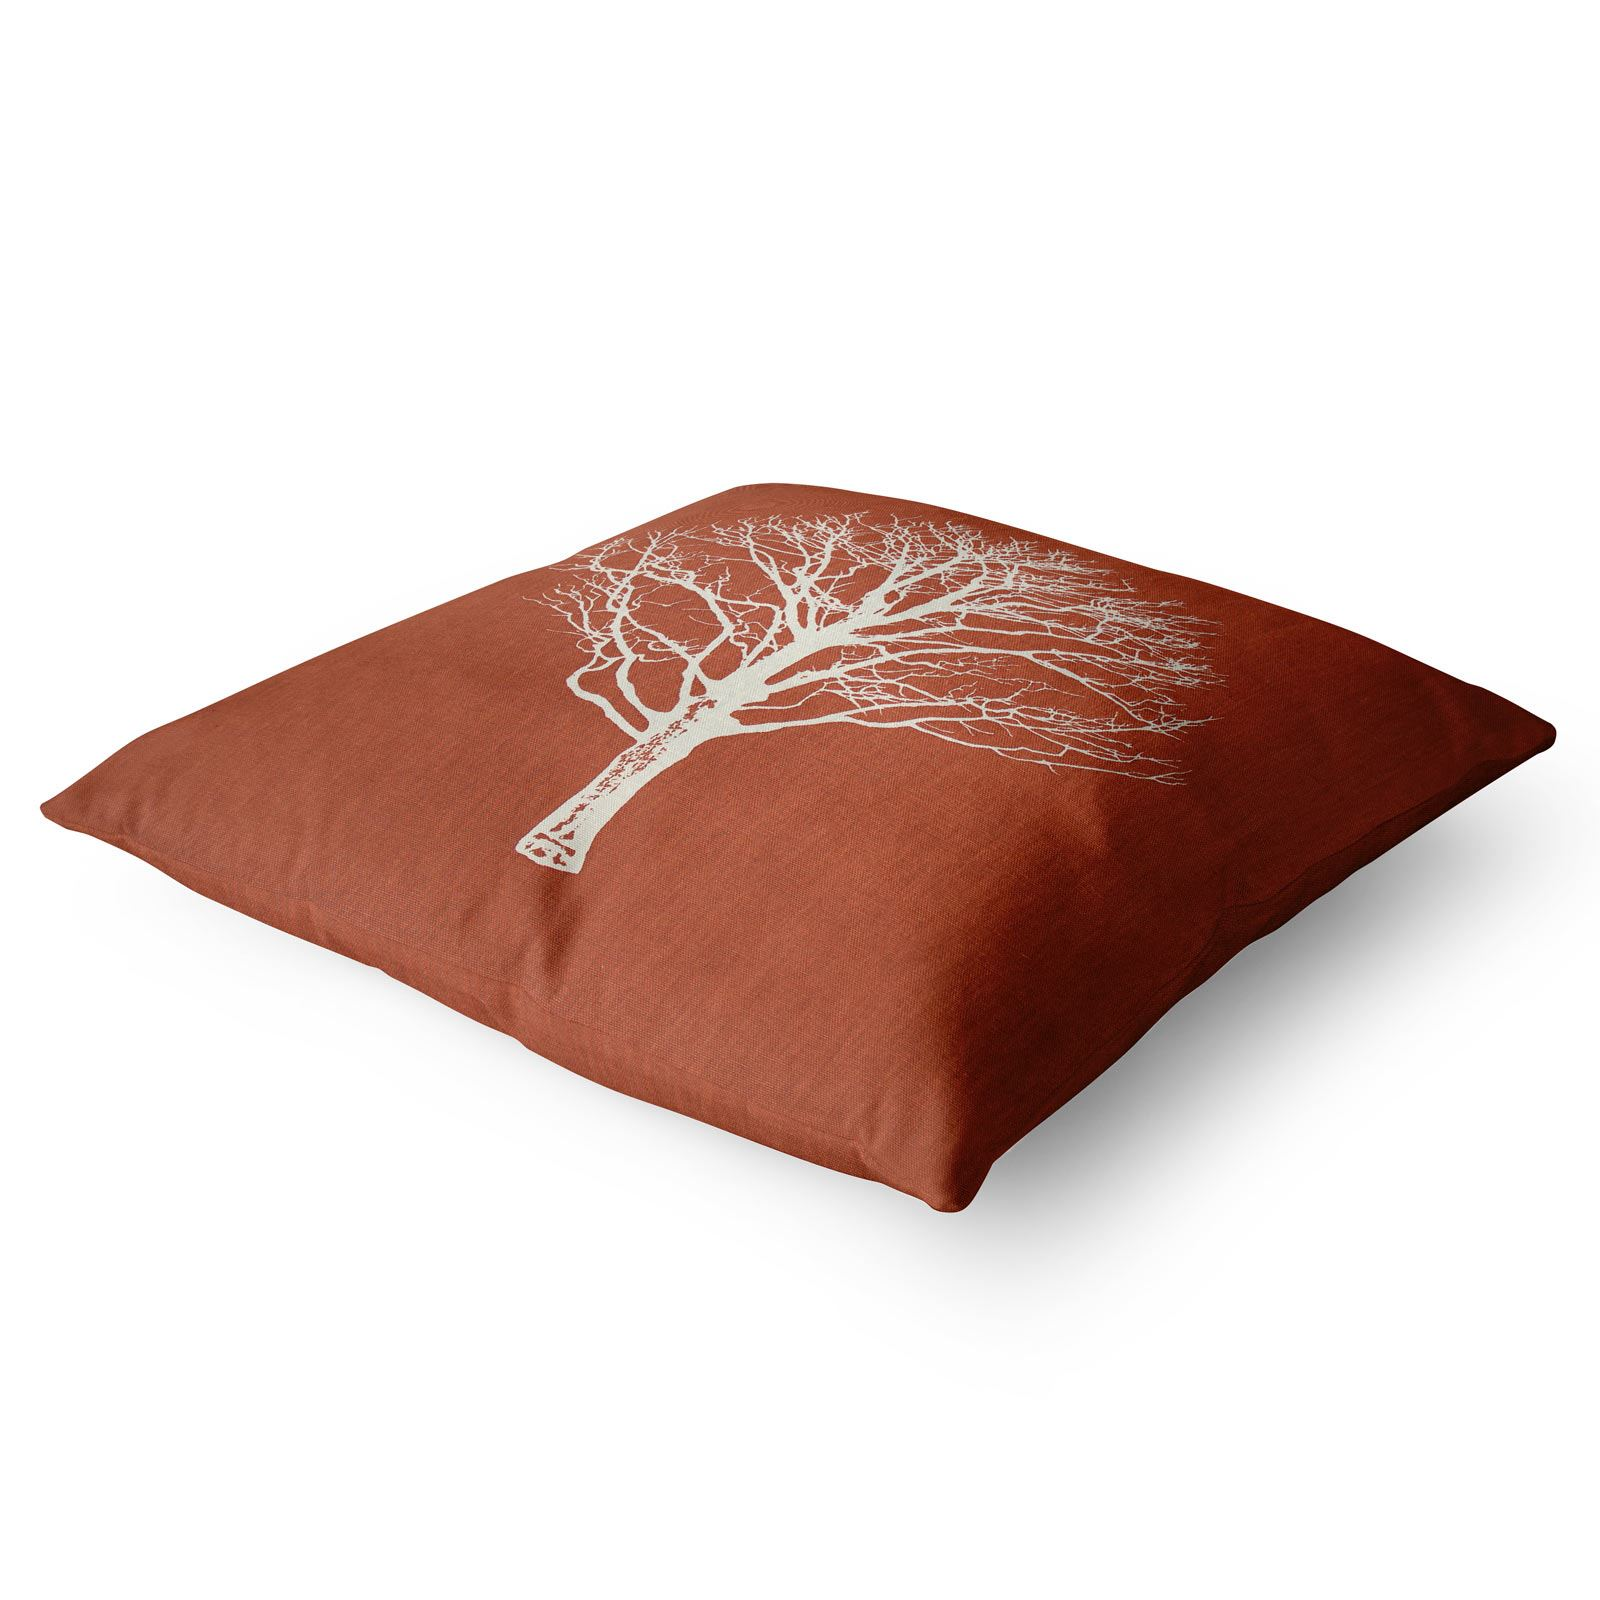 Woodland-Trees-Cushion-Cover-Modern-Reversible-Tree-Print-Covers-17-034-x-17-034 thumbnail 11